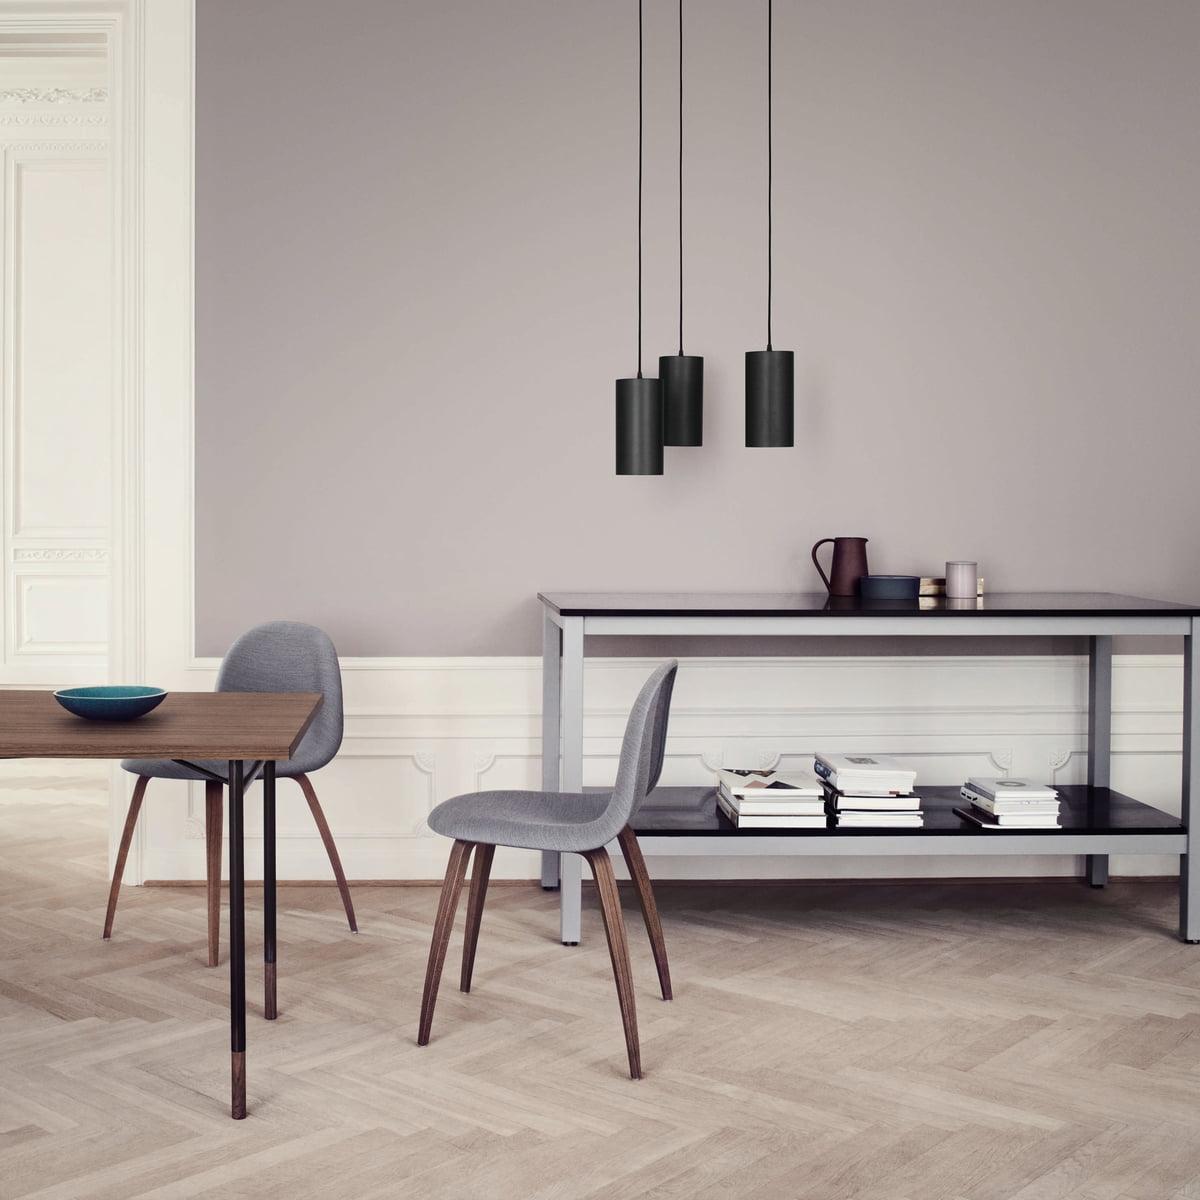 h2o pedrera pendelleuchte von gubi connox. Black Bedroom Furniture Sets. Home Design Ideas